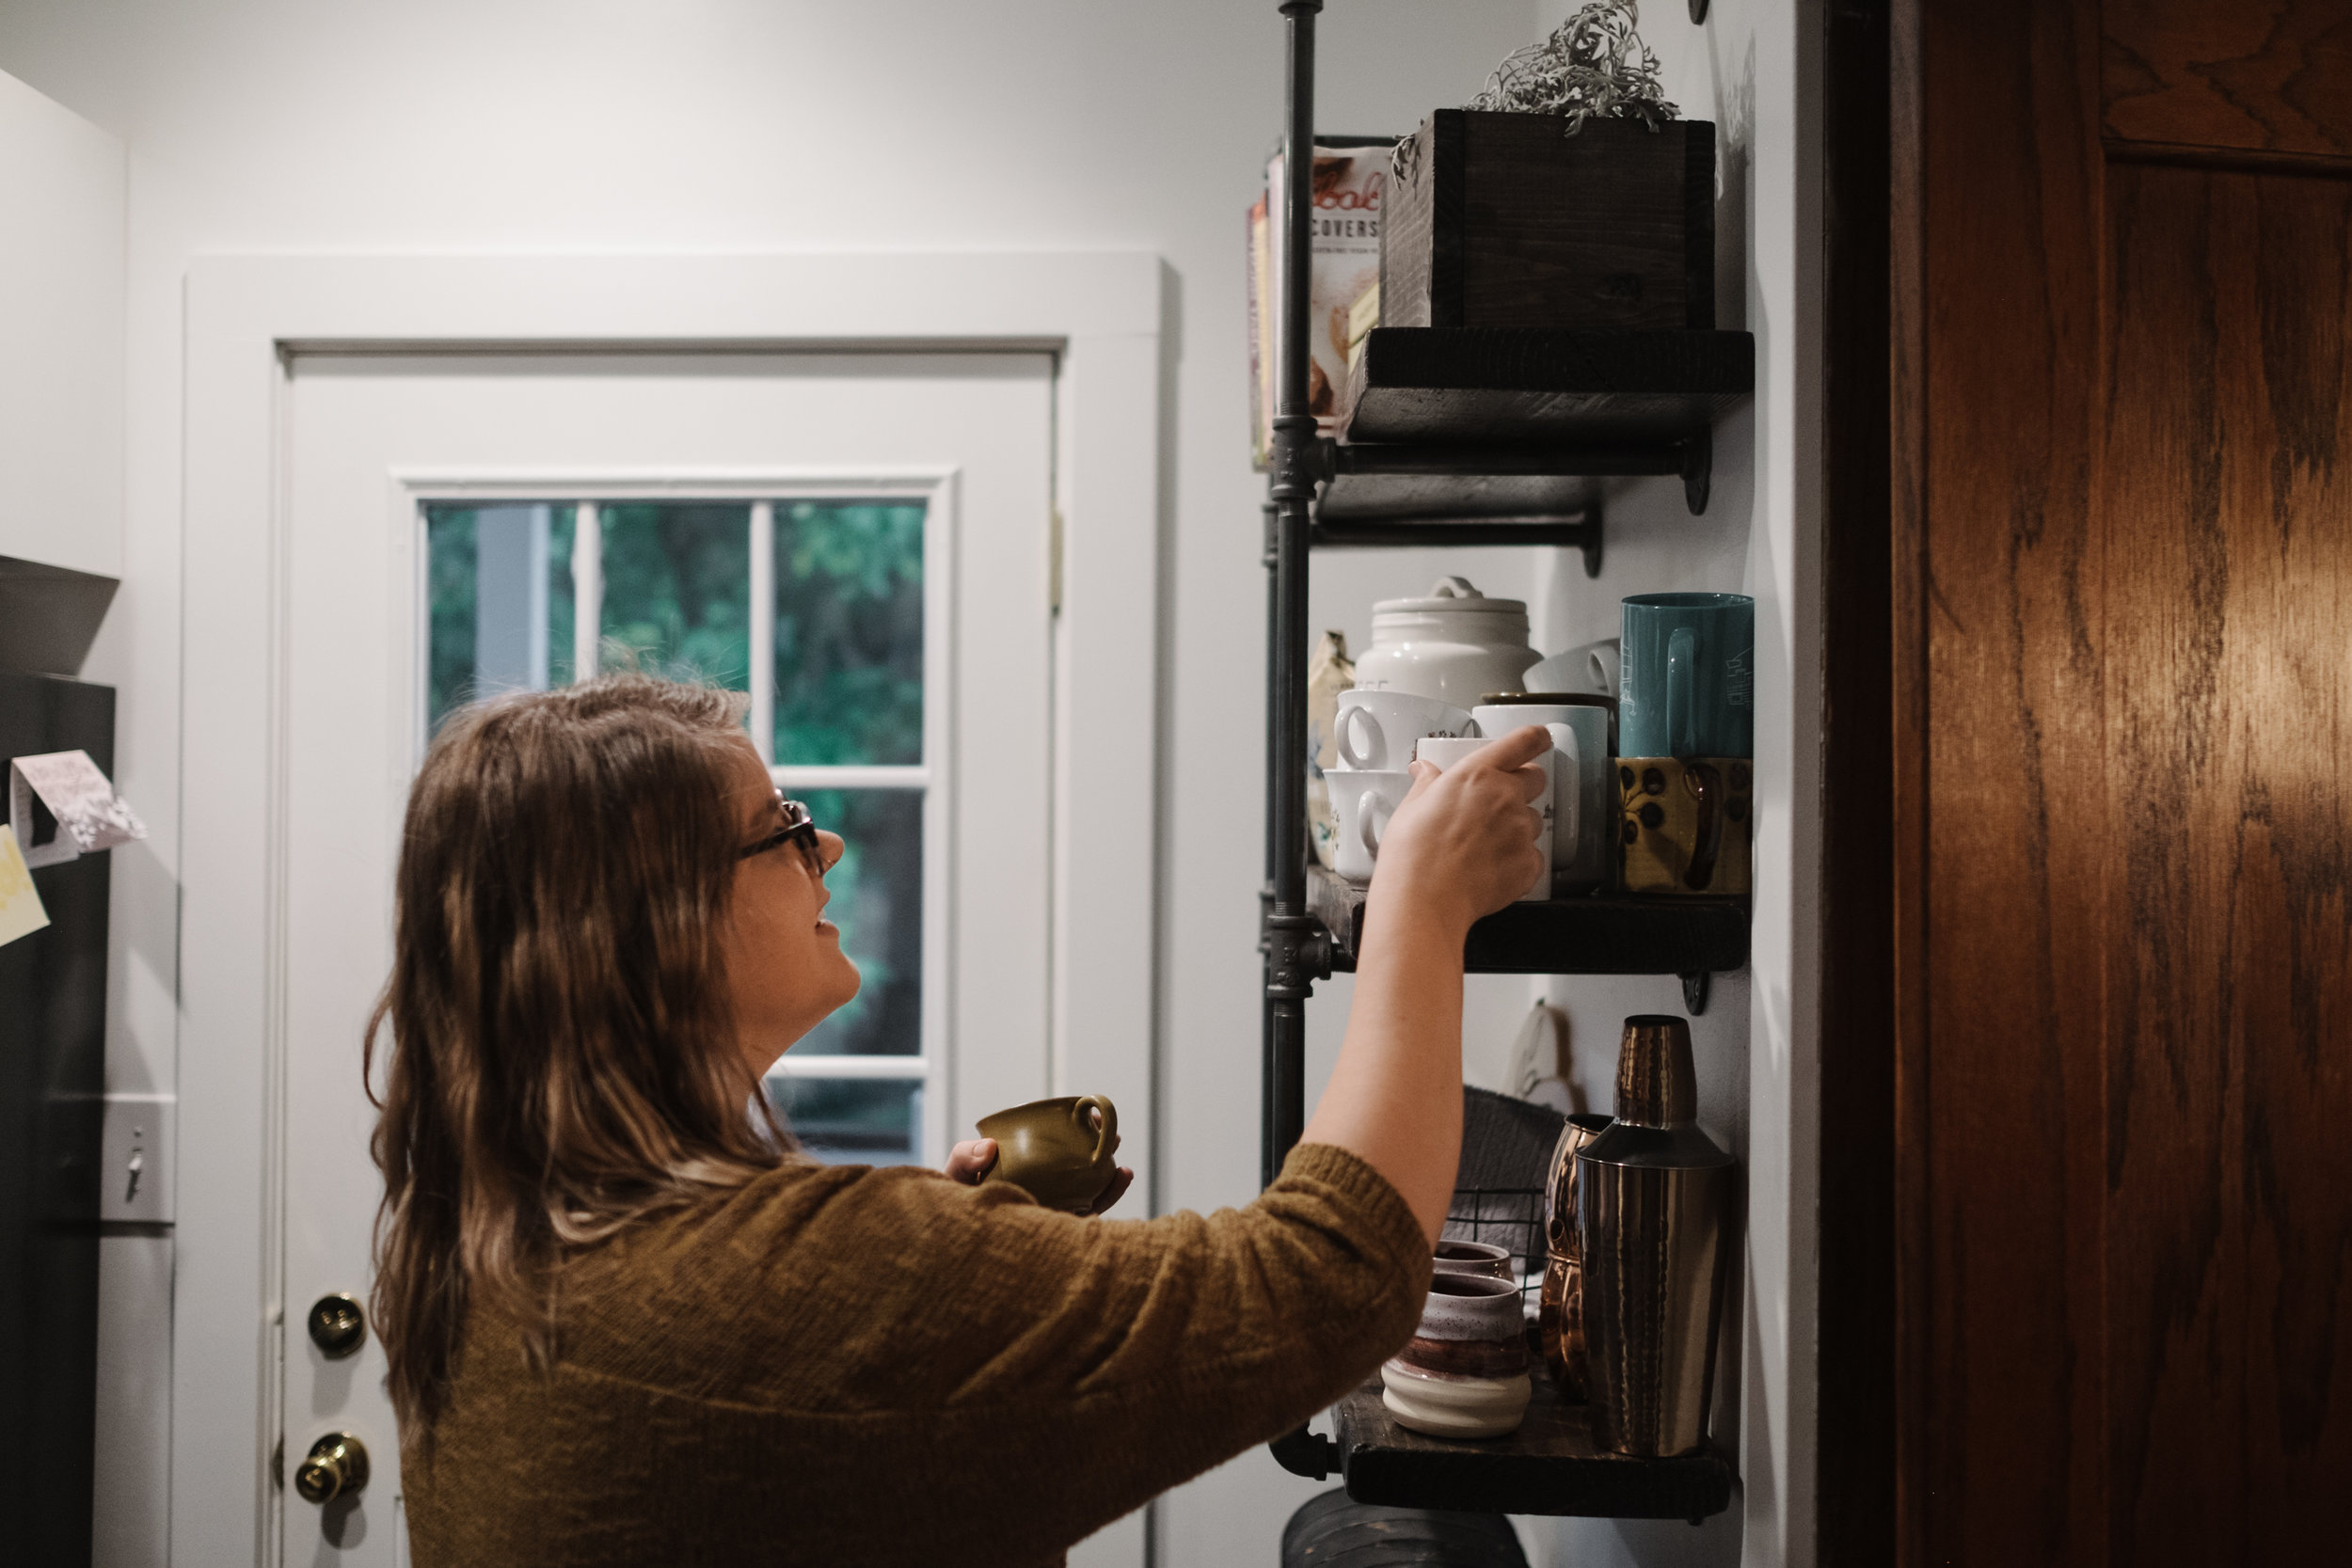 Woman grabbing mug off shelf